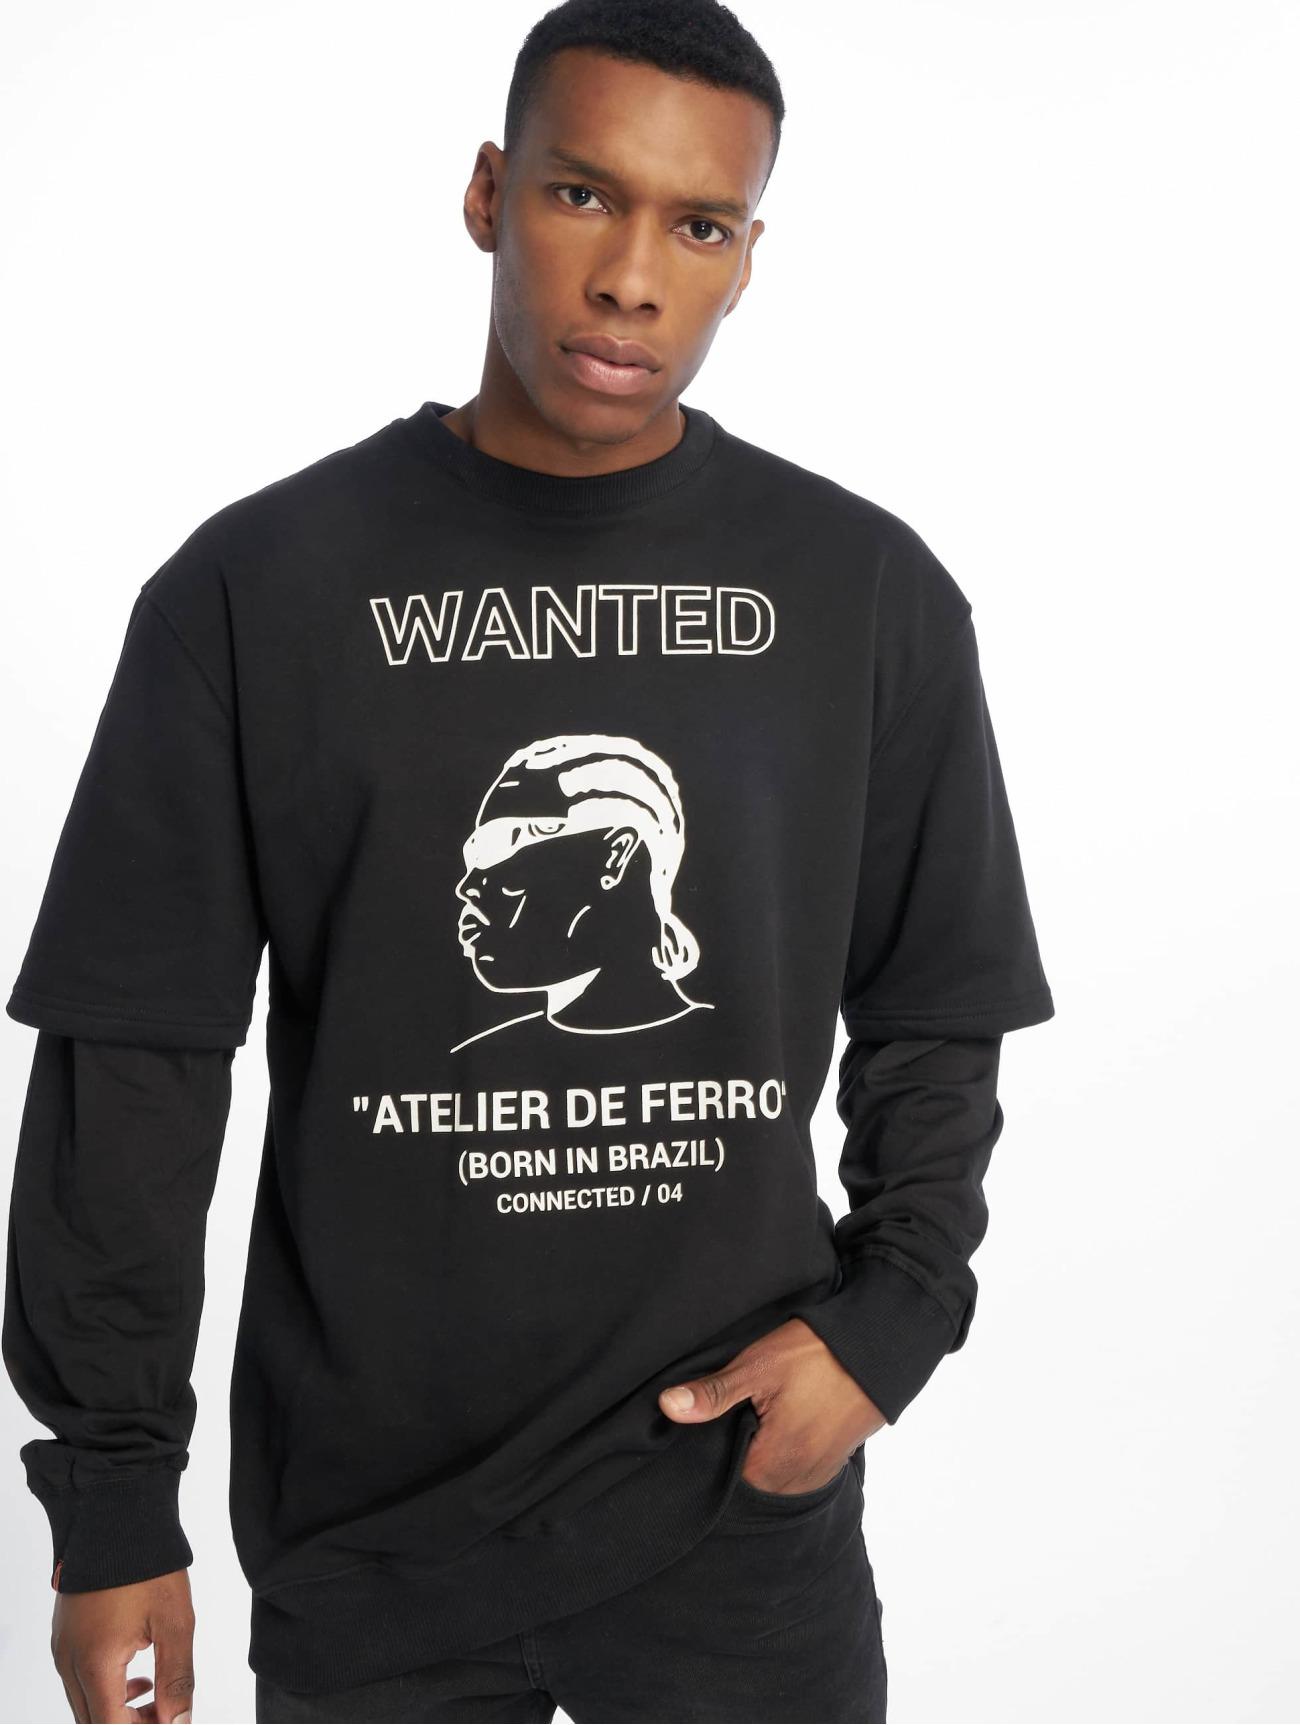 De Ferro   Arm B Wanted  noir Homme Sweat & Pull  604878  Homme Hauts